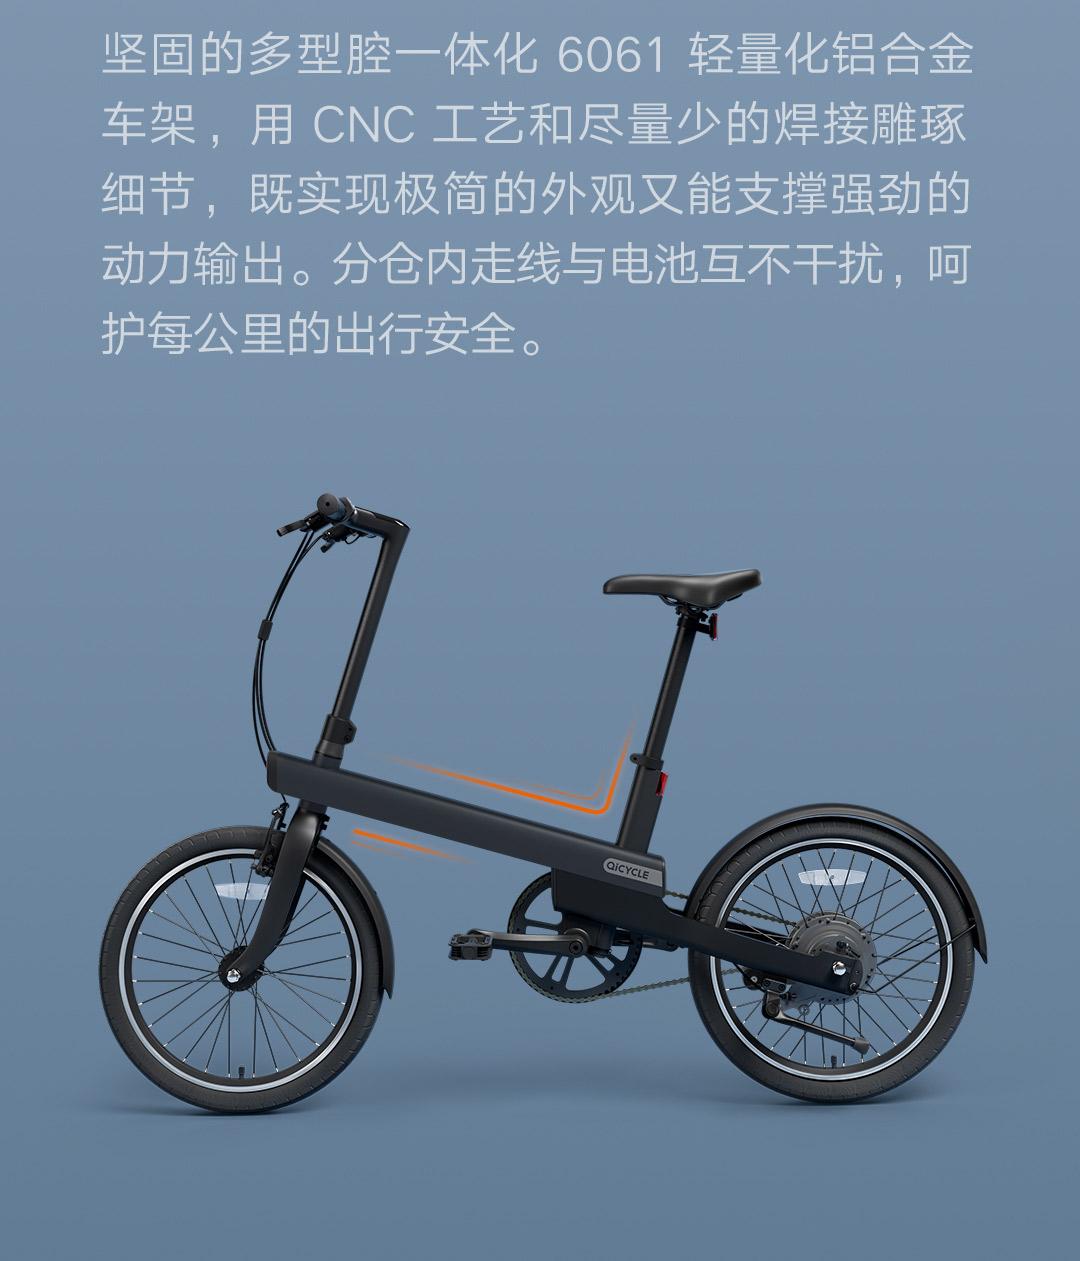 Bicicleta Xiaomi cuadro